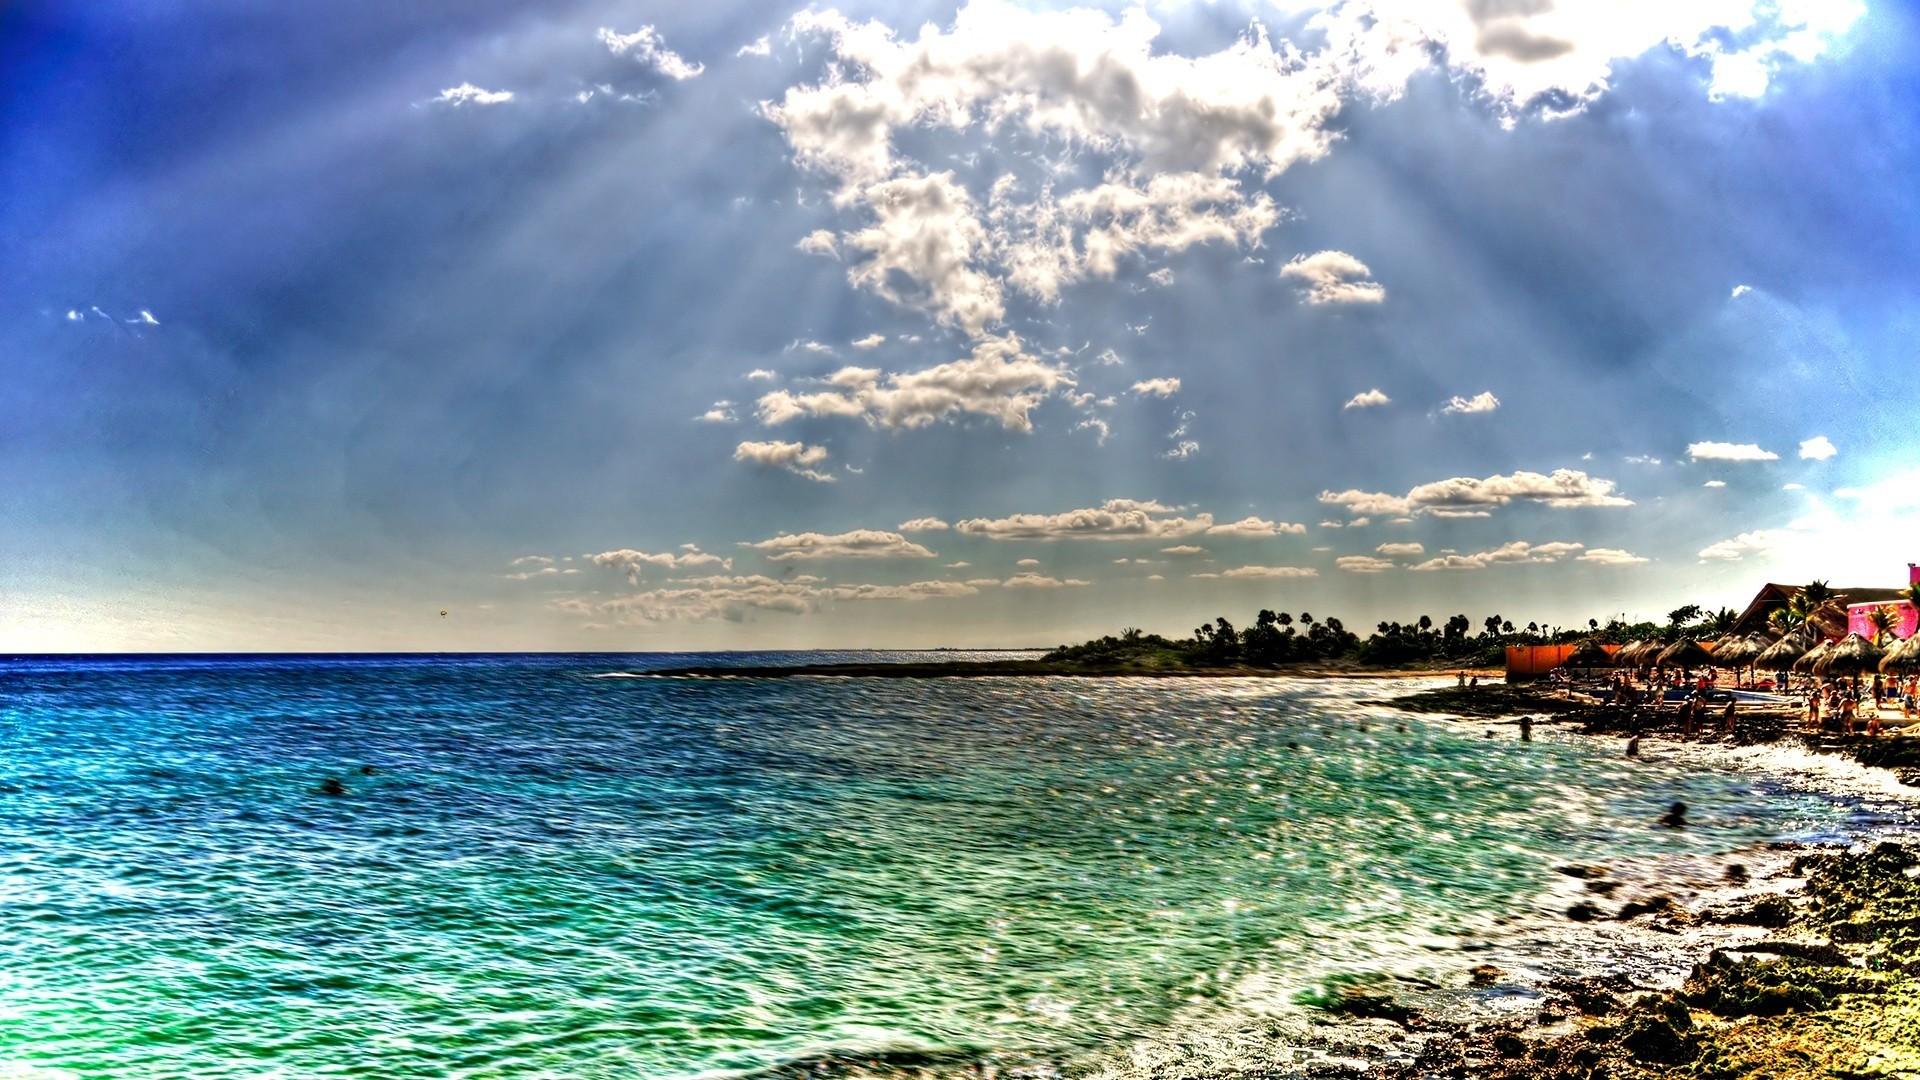 Wallpaper beach, sea, sun, beams, colors, coast, people